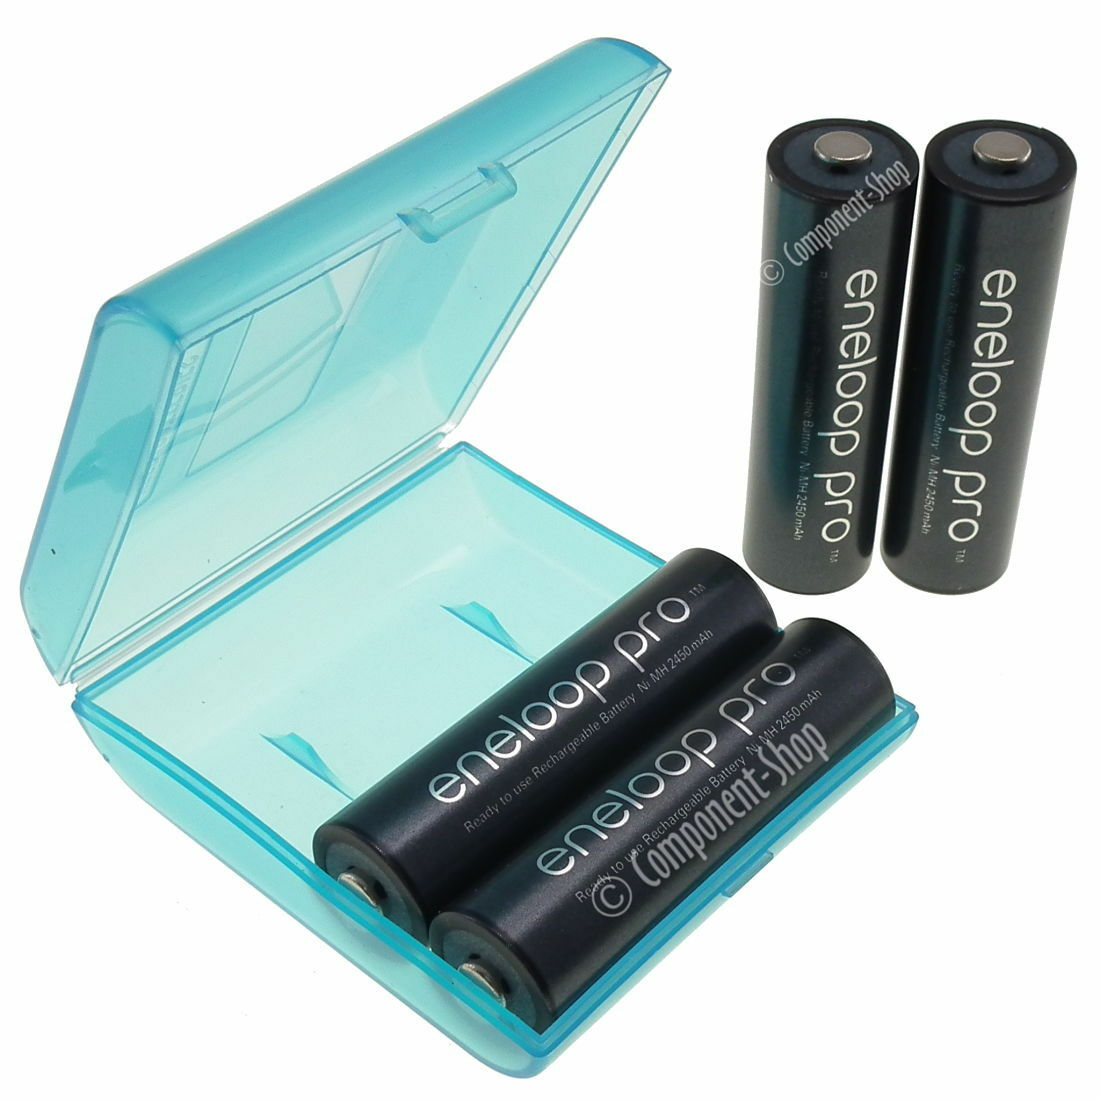 4 x panasonic eneloop pro aa 2550mah nimh rechargeable battery + battery case